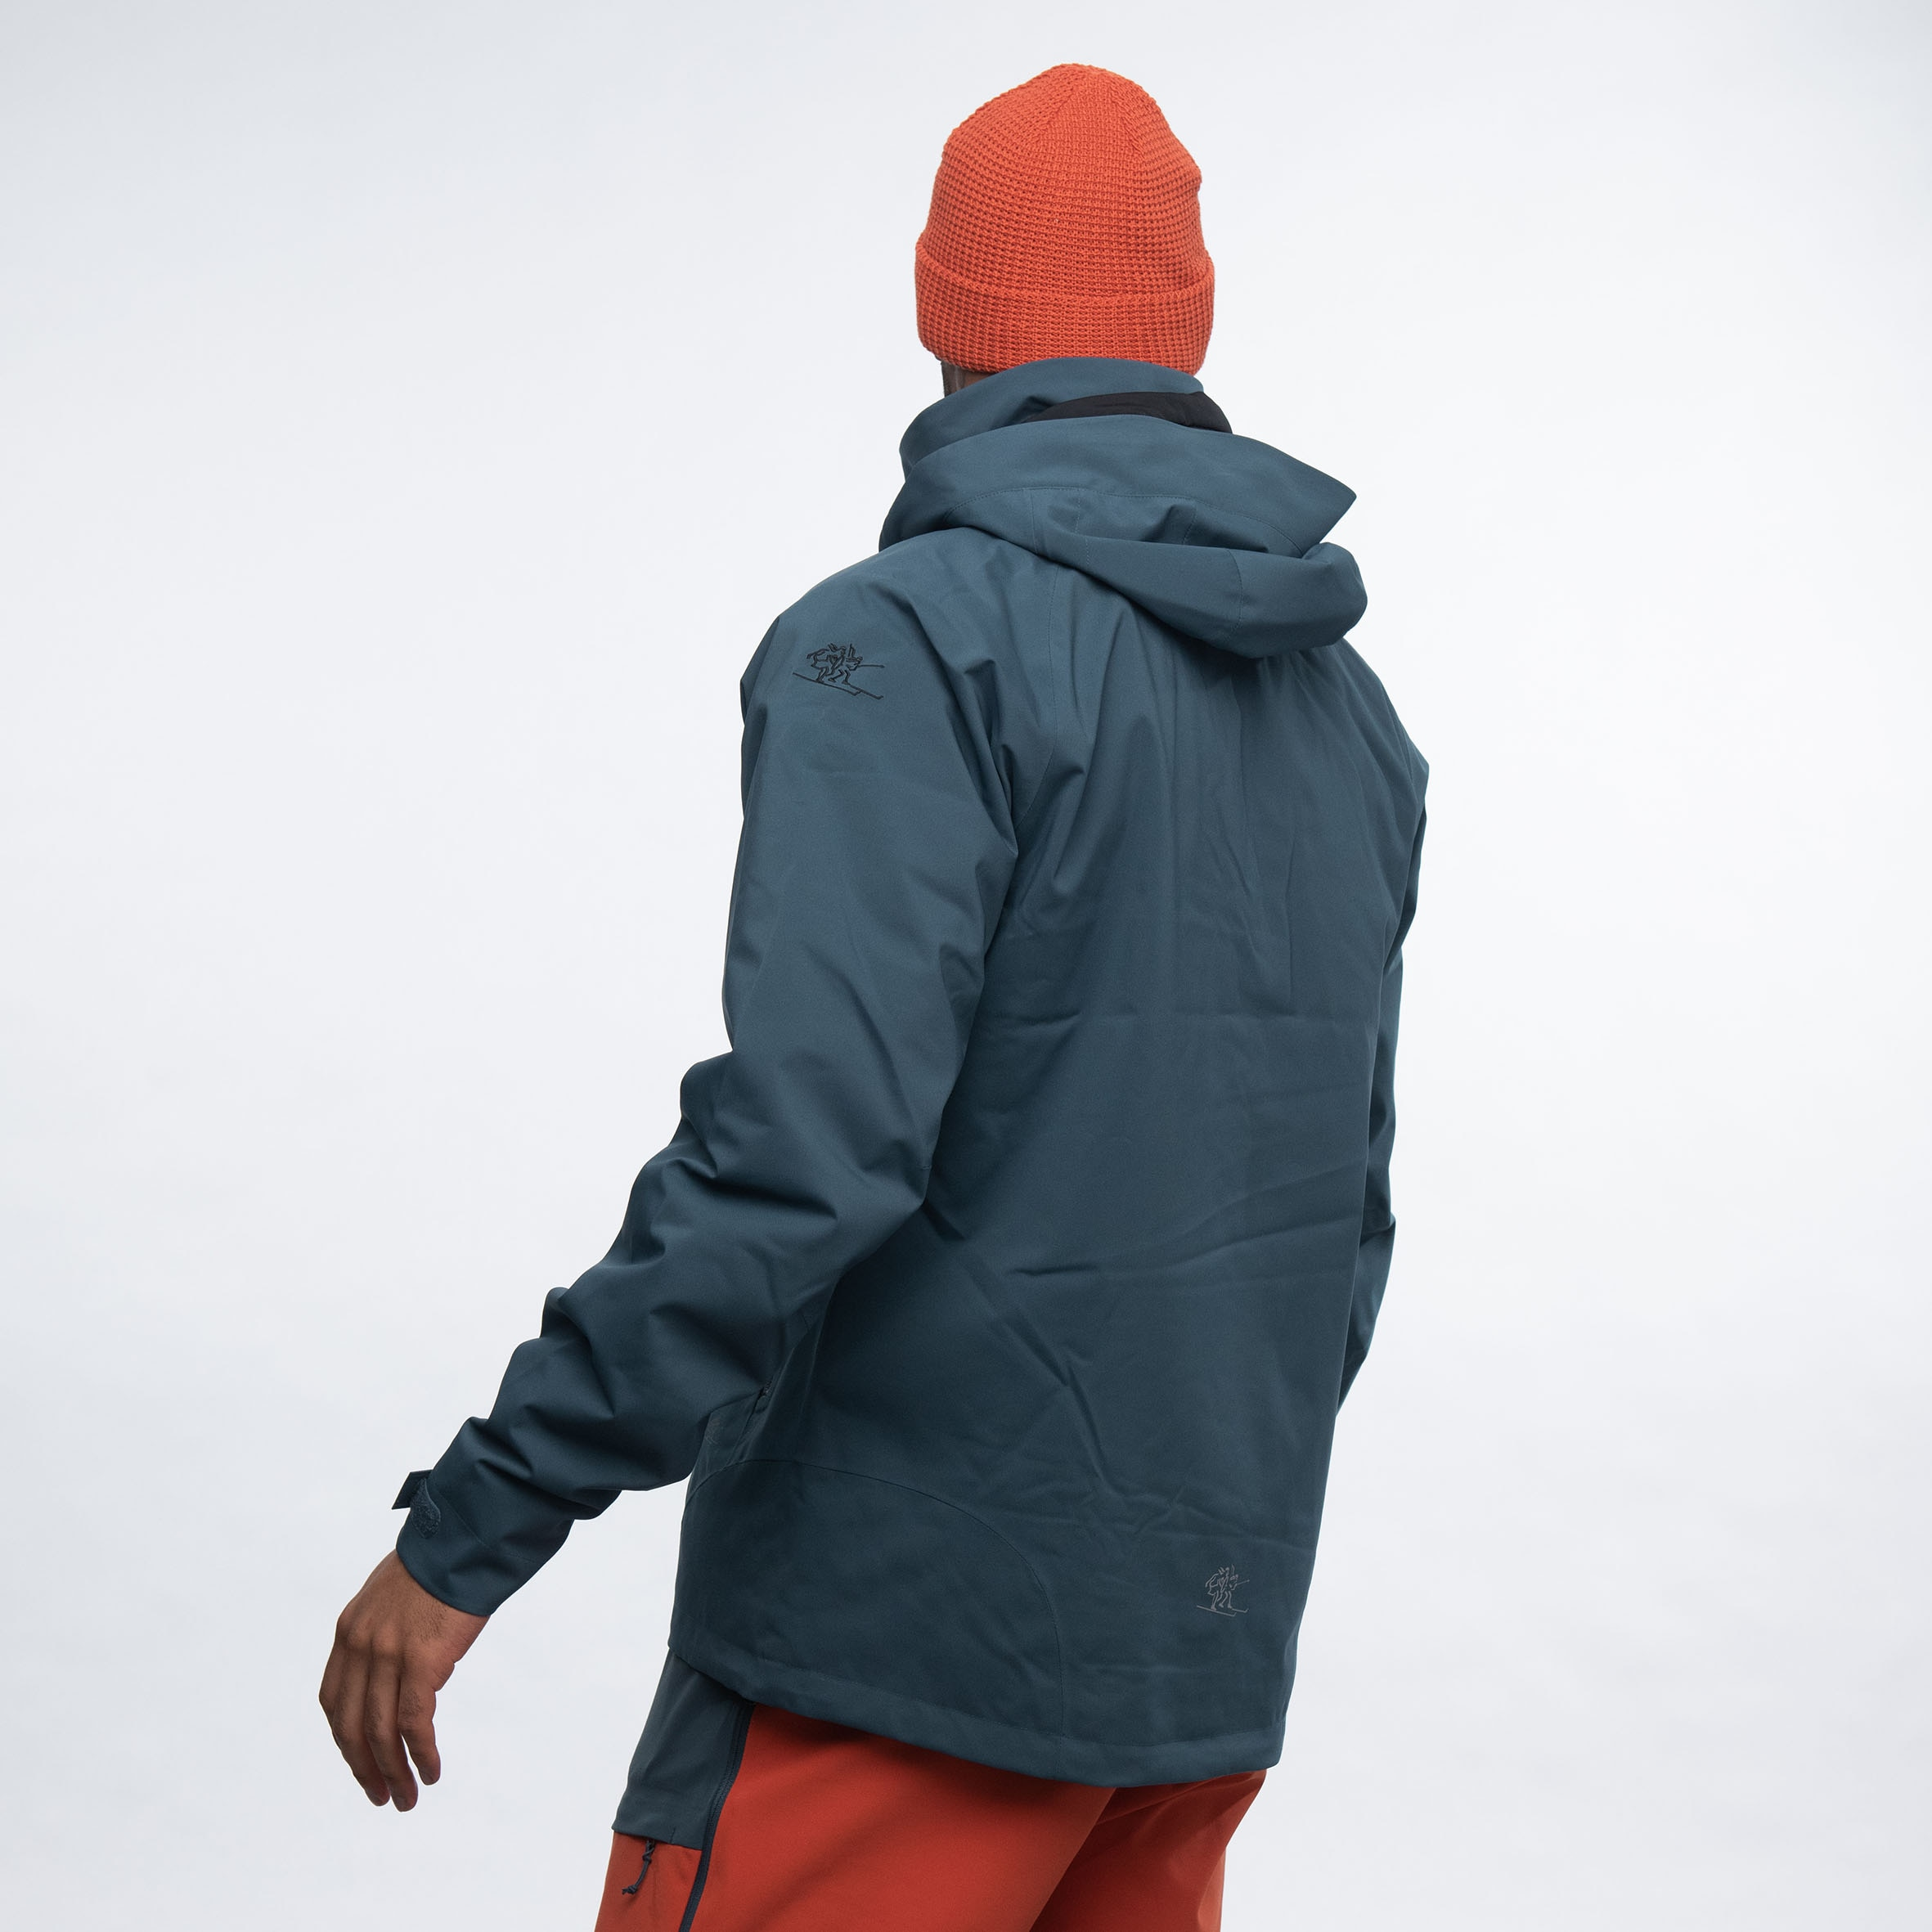 Flya Insulated Jacket